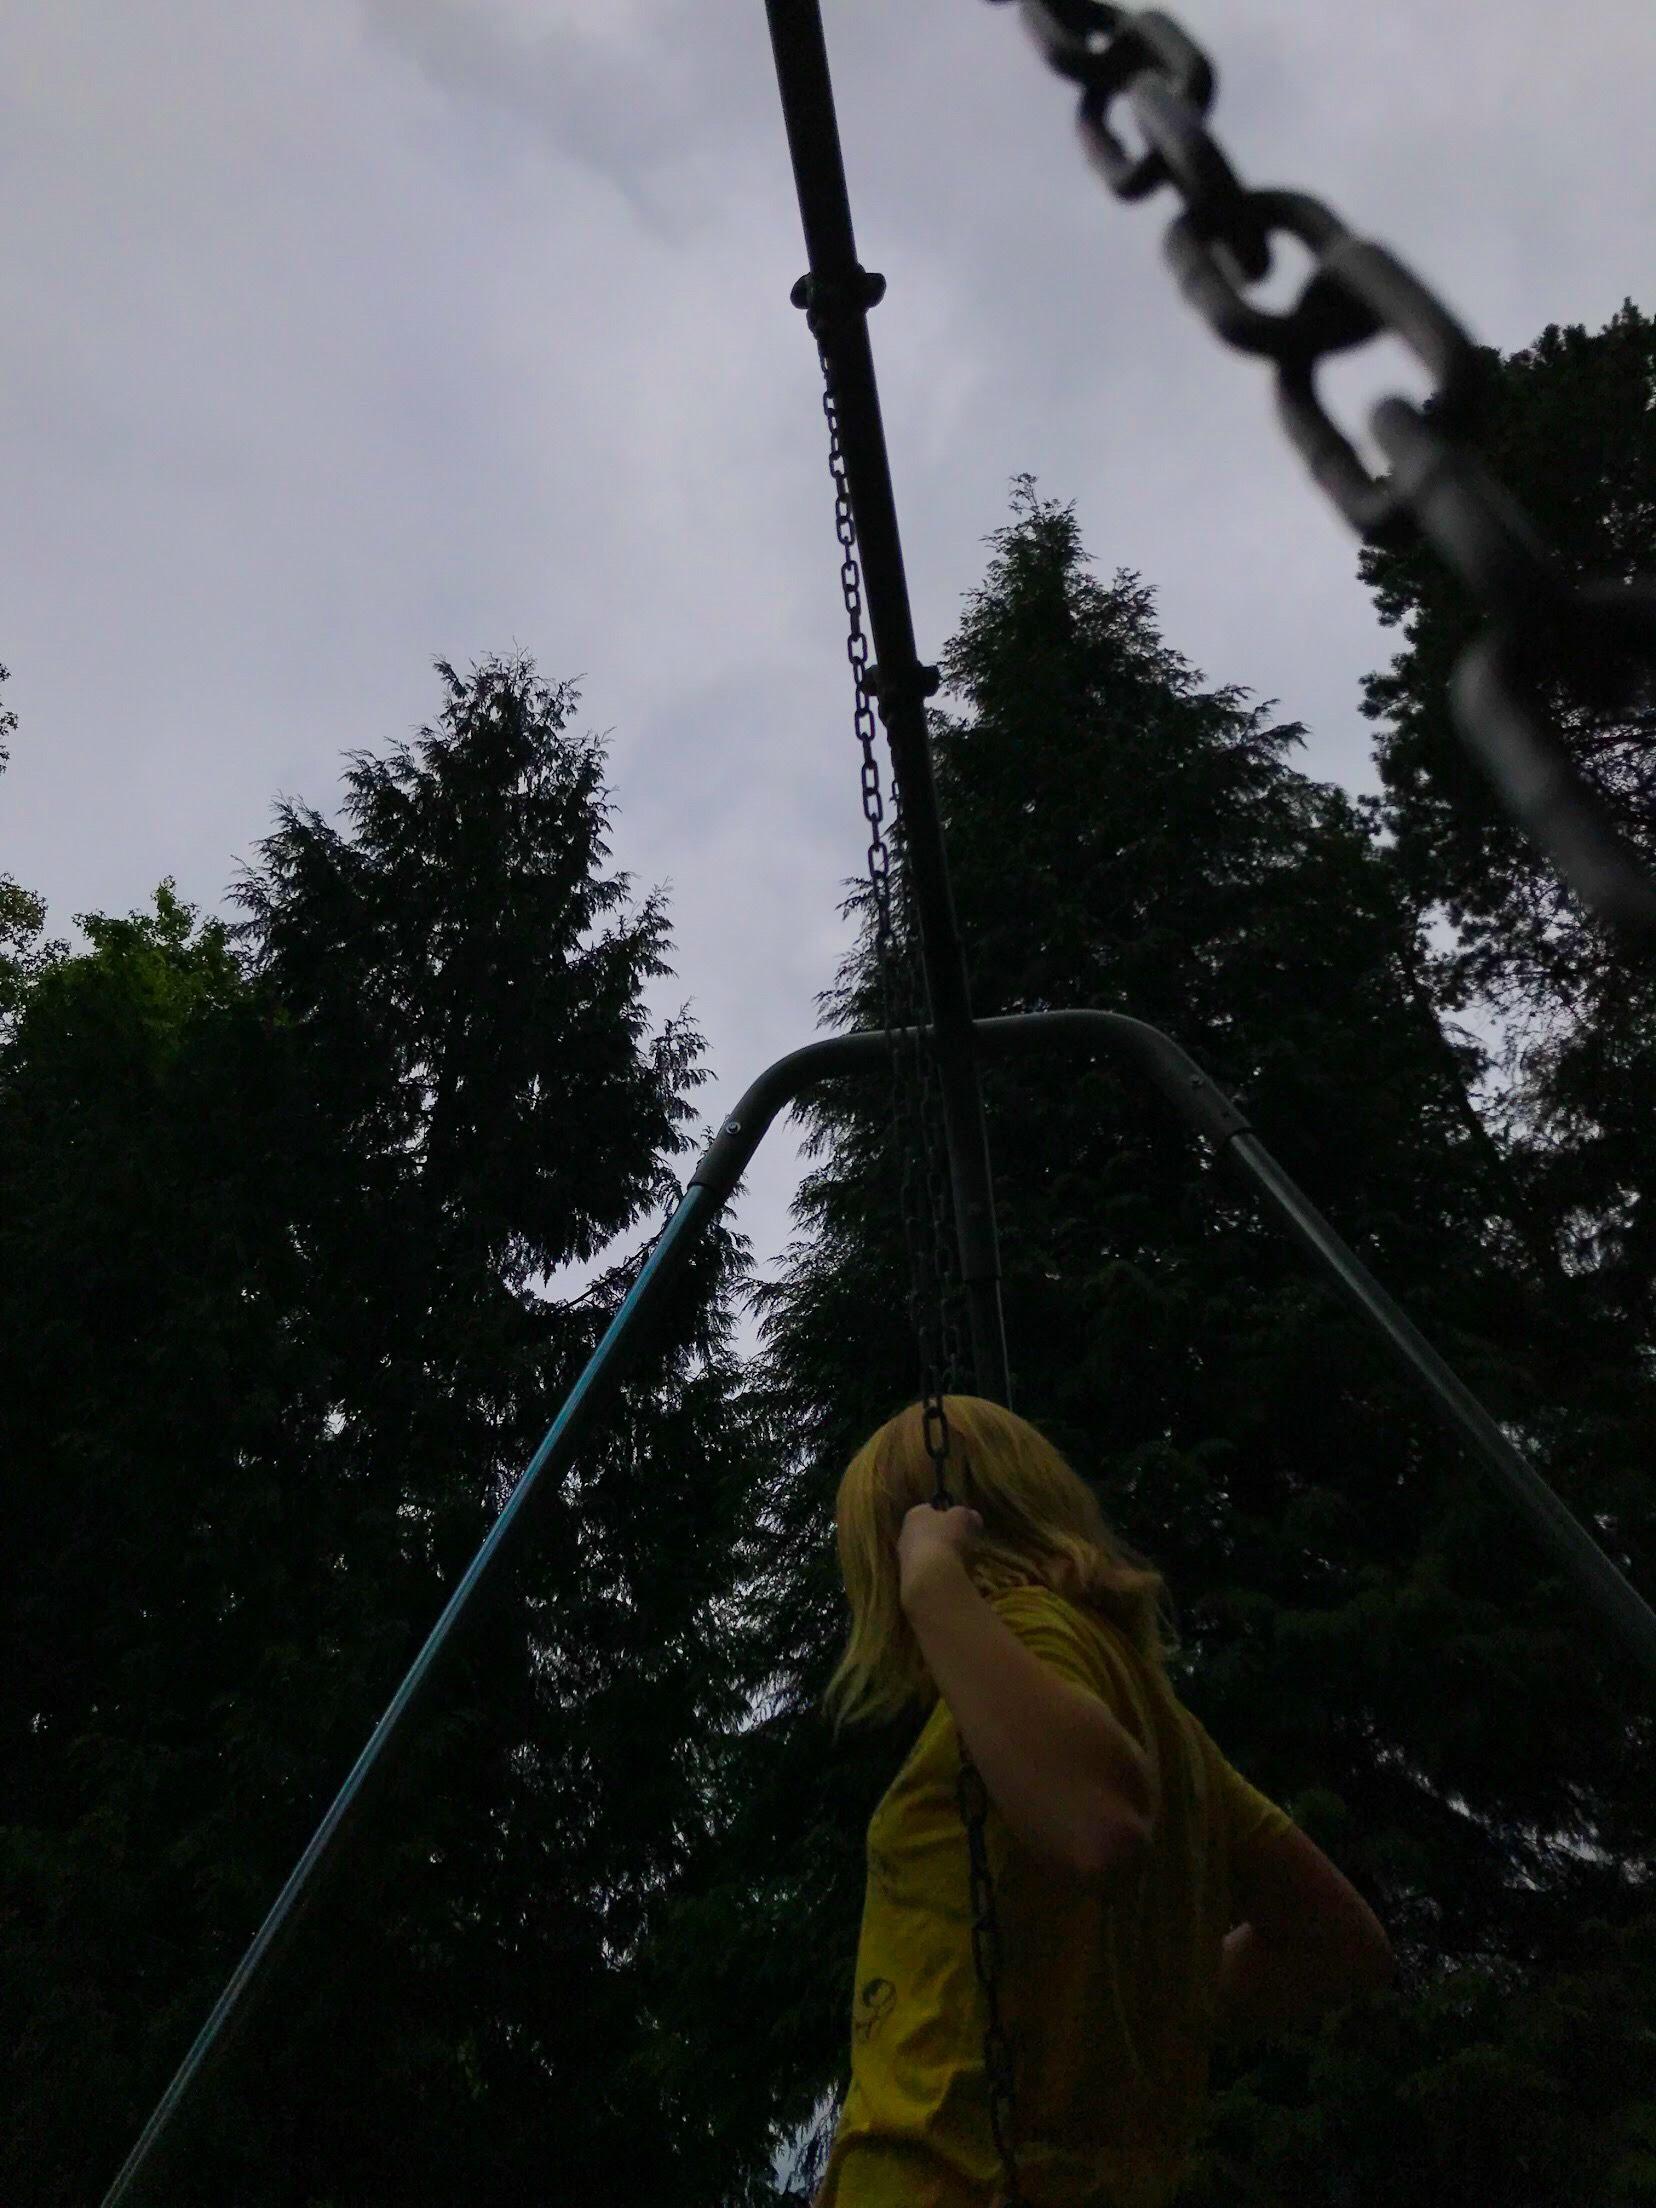 Girl in yellow shirt on swing outside